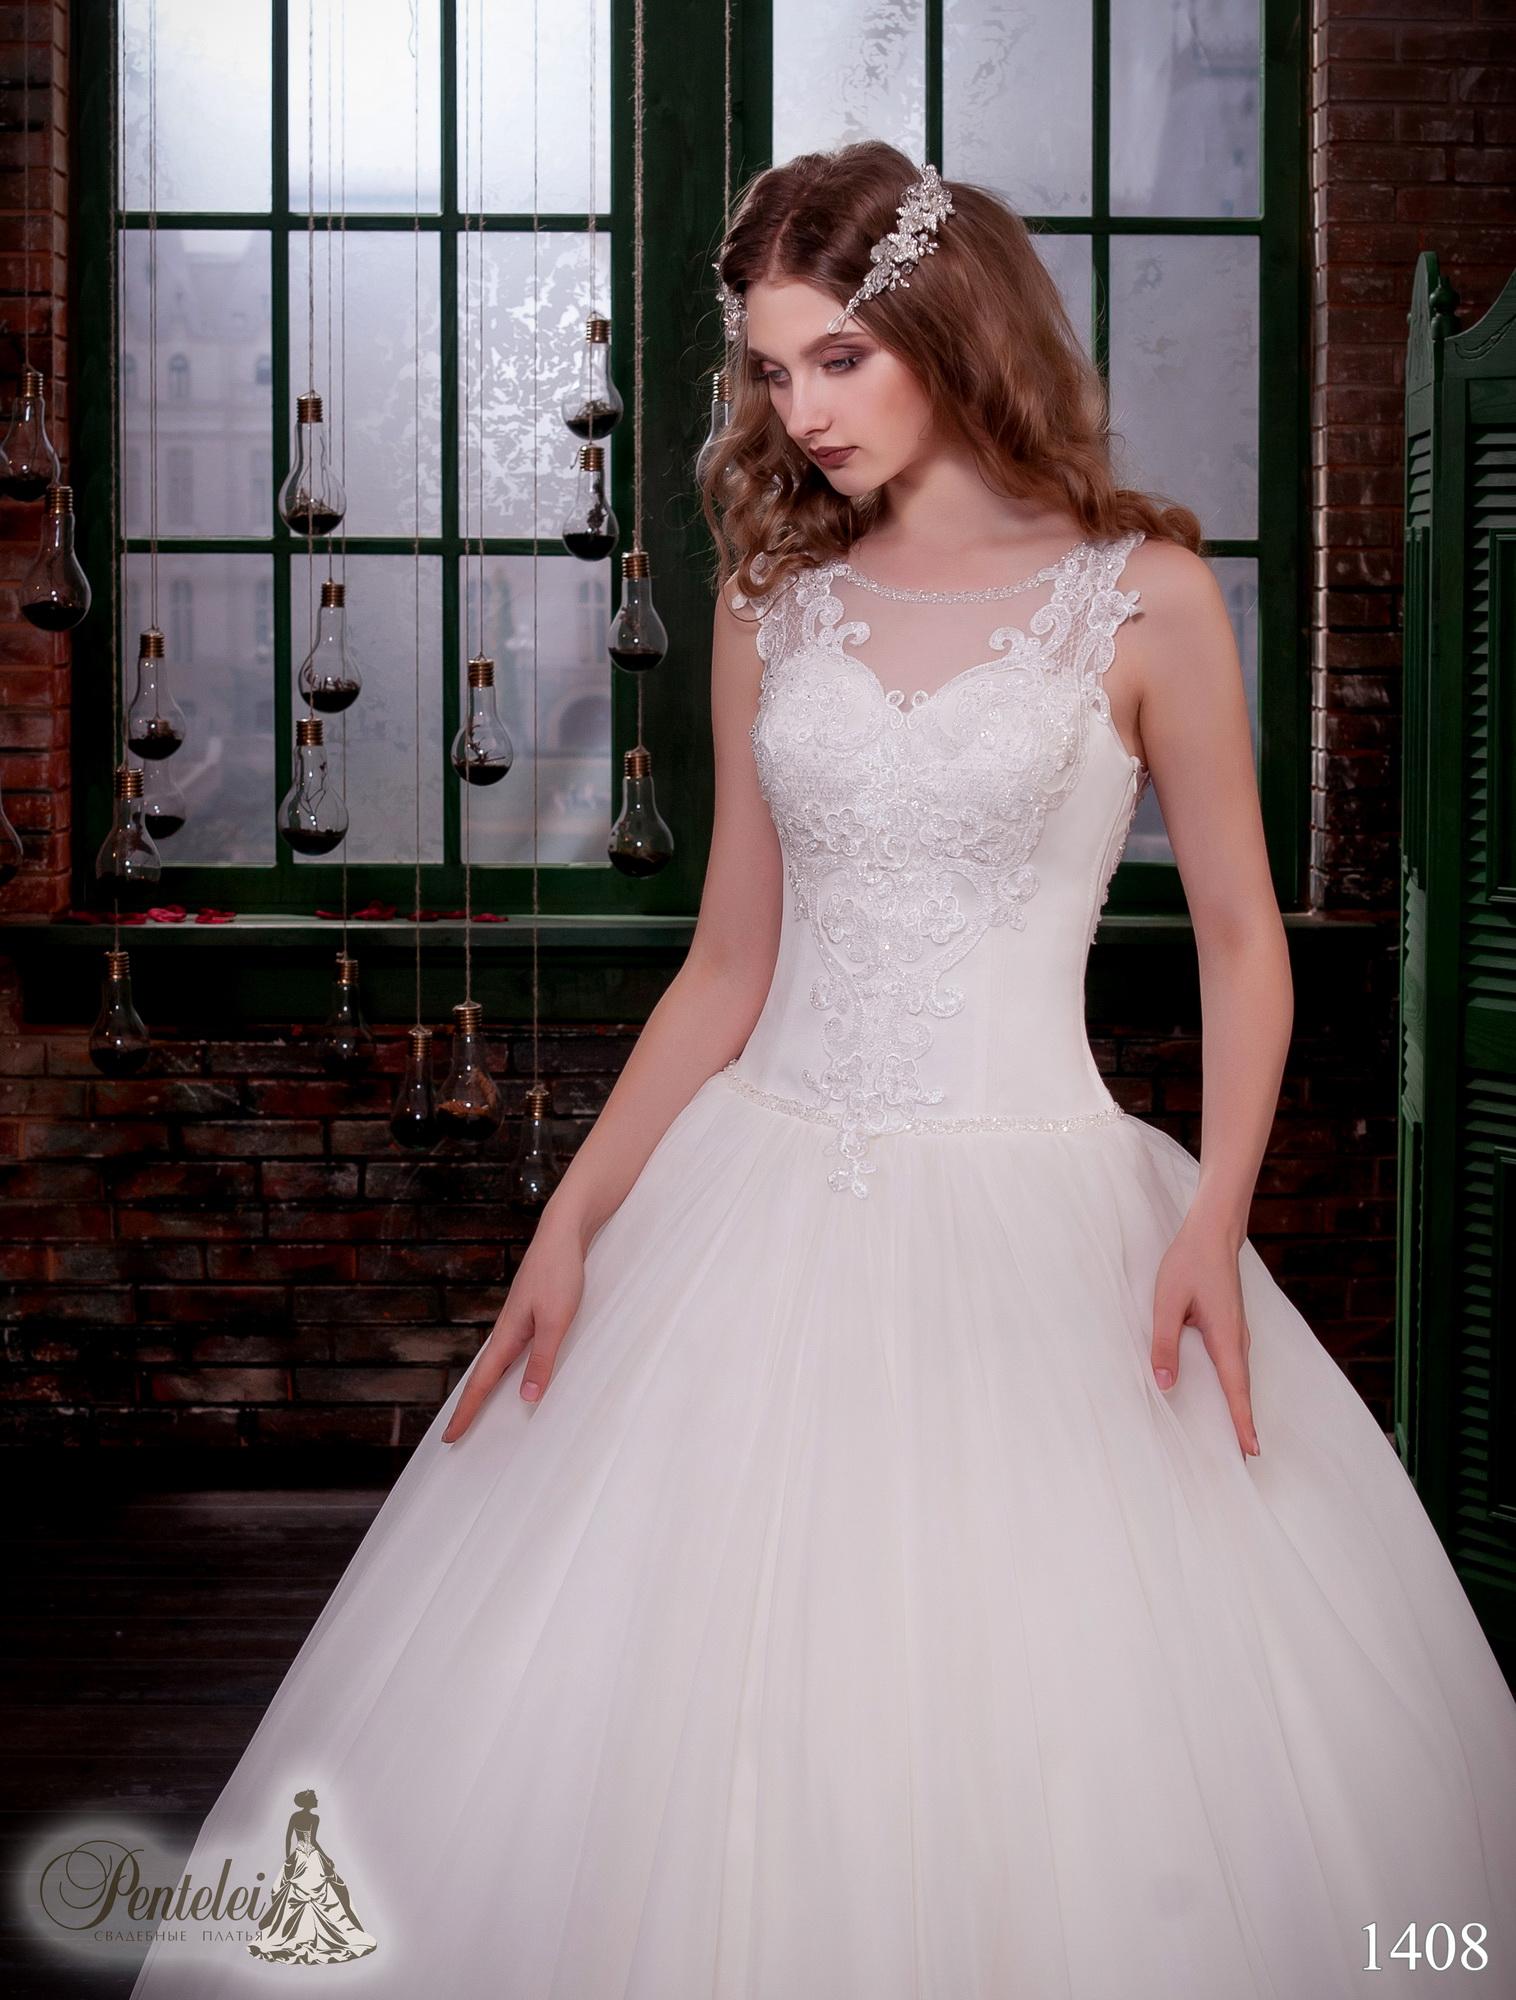 1408 | Buy wedding dresses wholesale from Pentelei